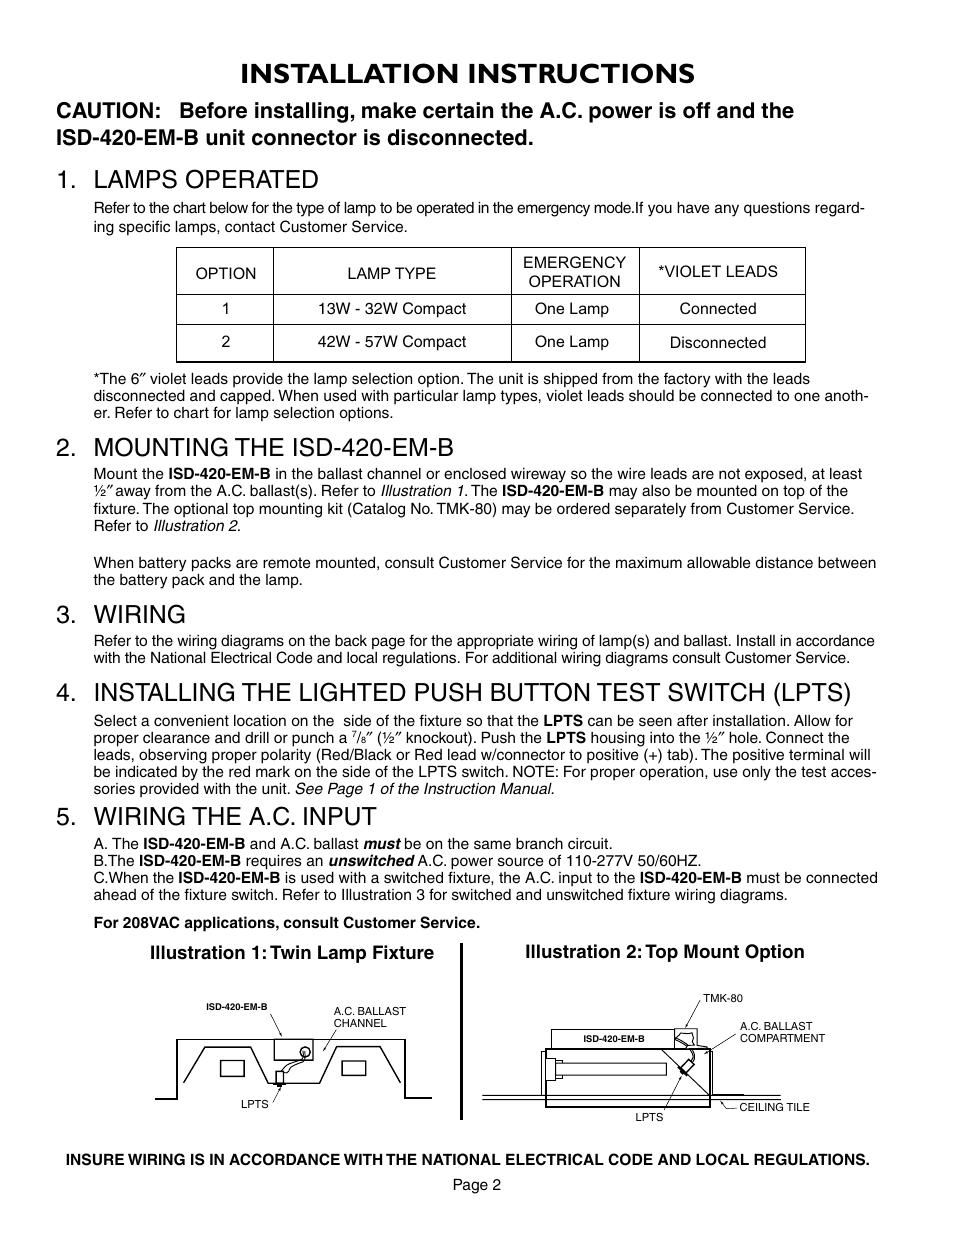 iota isd 420 em b page2?resize=665%2C861 iota i 80 emergency ballast wiring diagram wiring diagram iota i 80 emergency ballast wiring diagram at panicattacktreatment.co